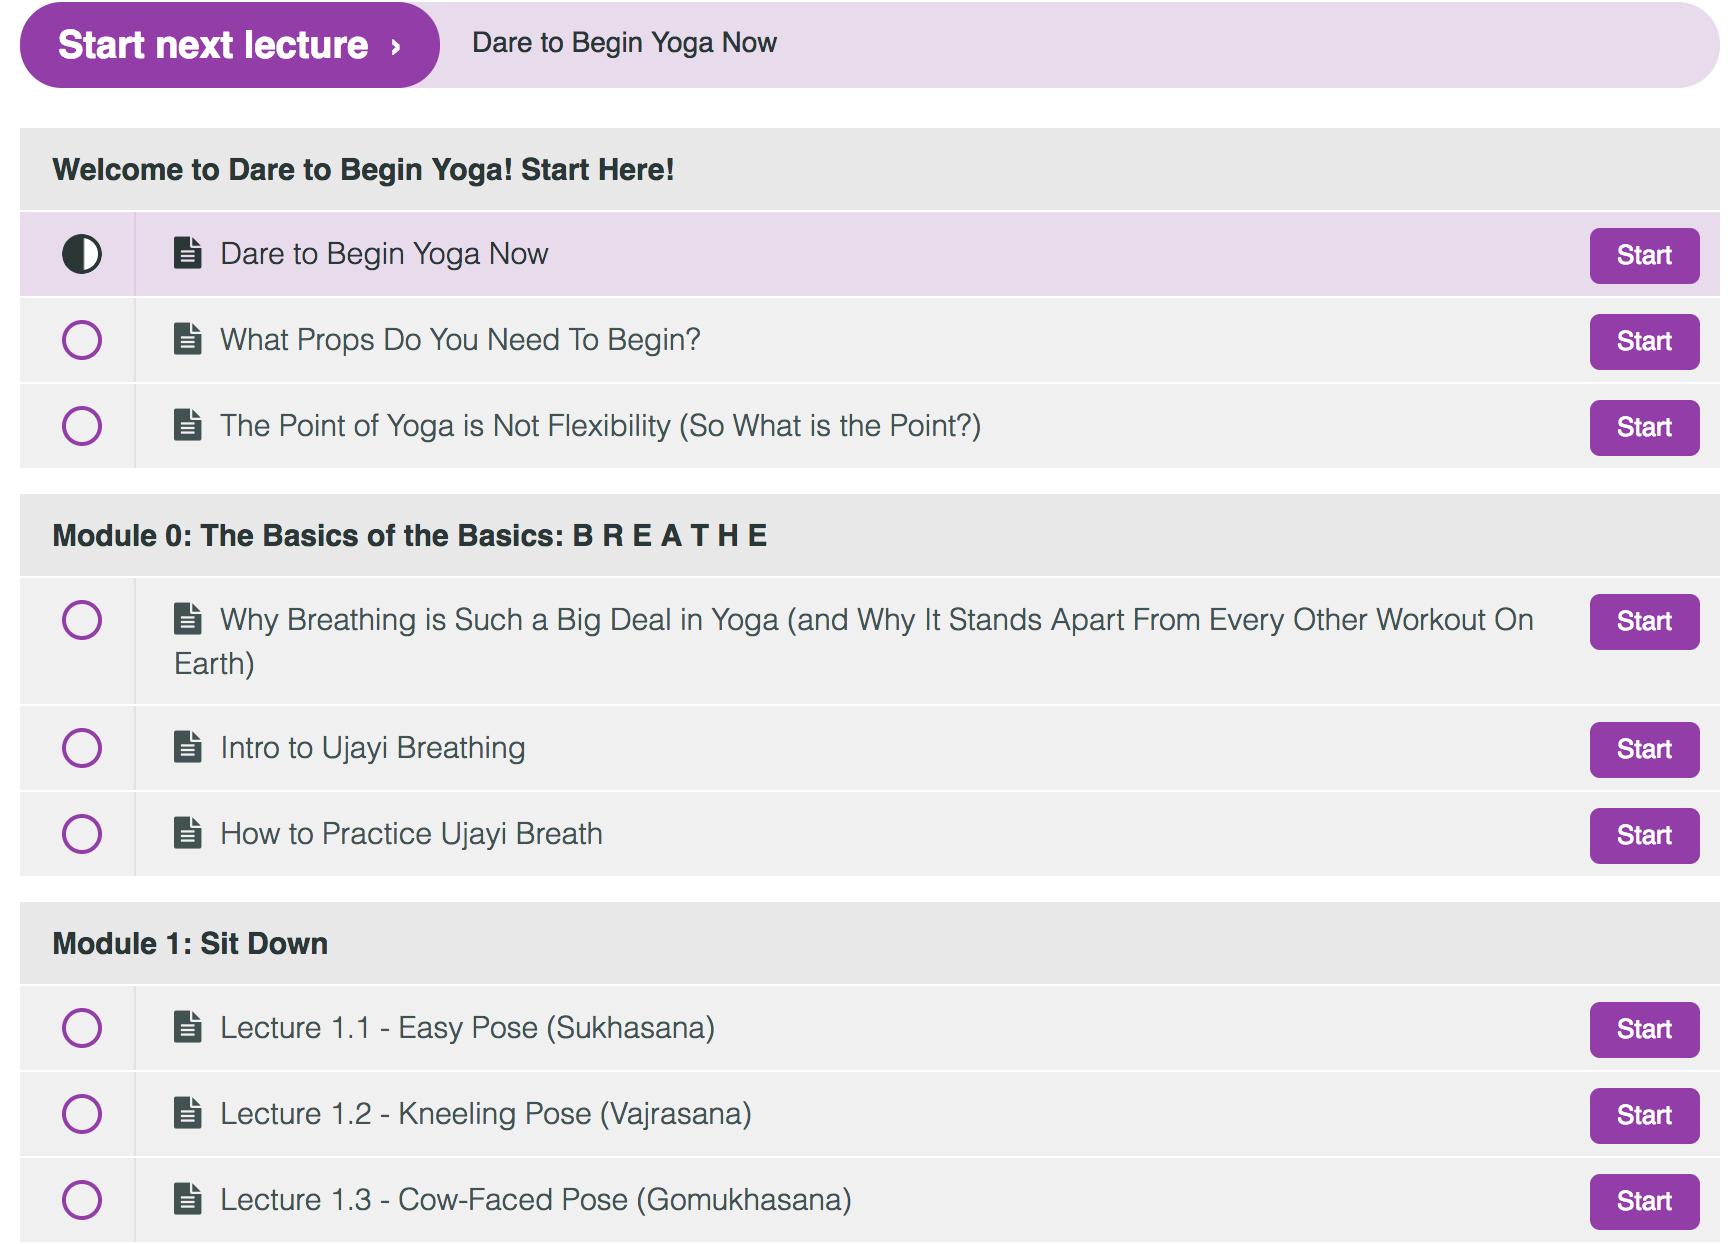 yoga studios near me, asana yoga, yoga for men, yoga exercises, vinyasa yoga, yoga nidra, restorative yoga